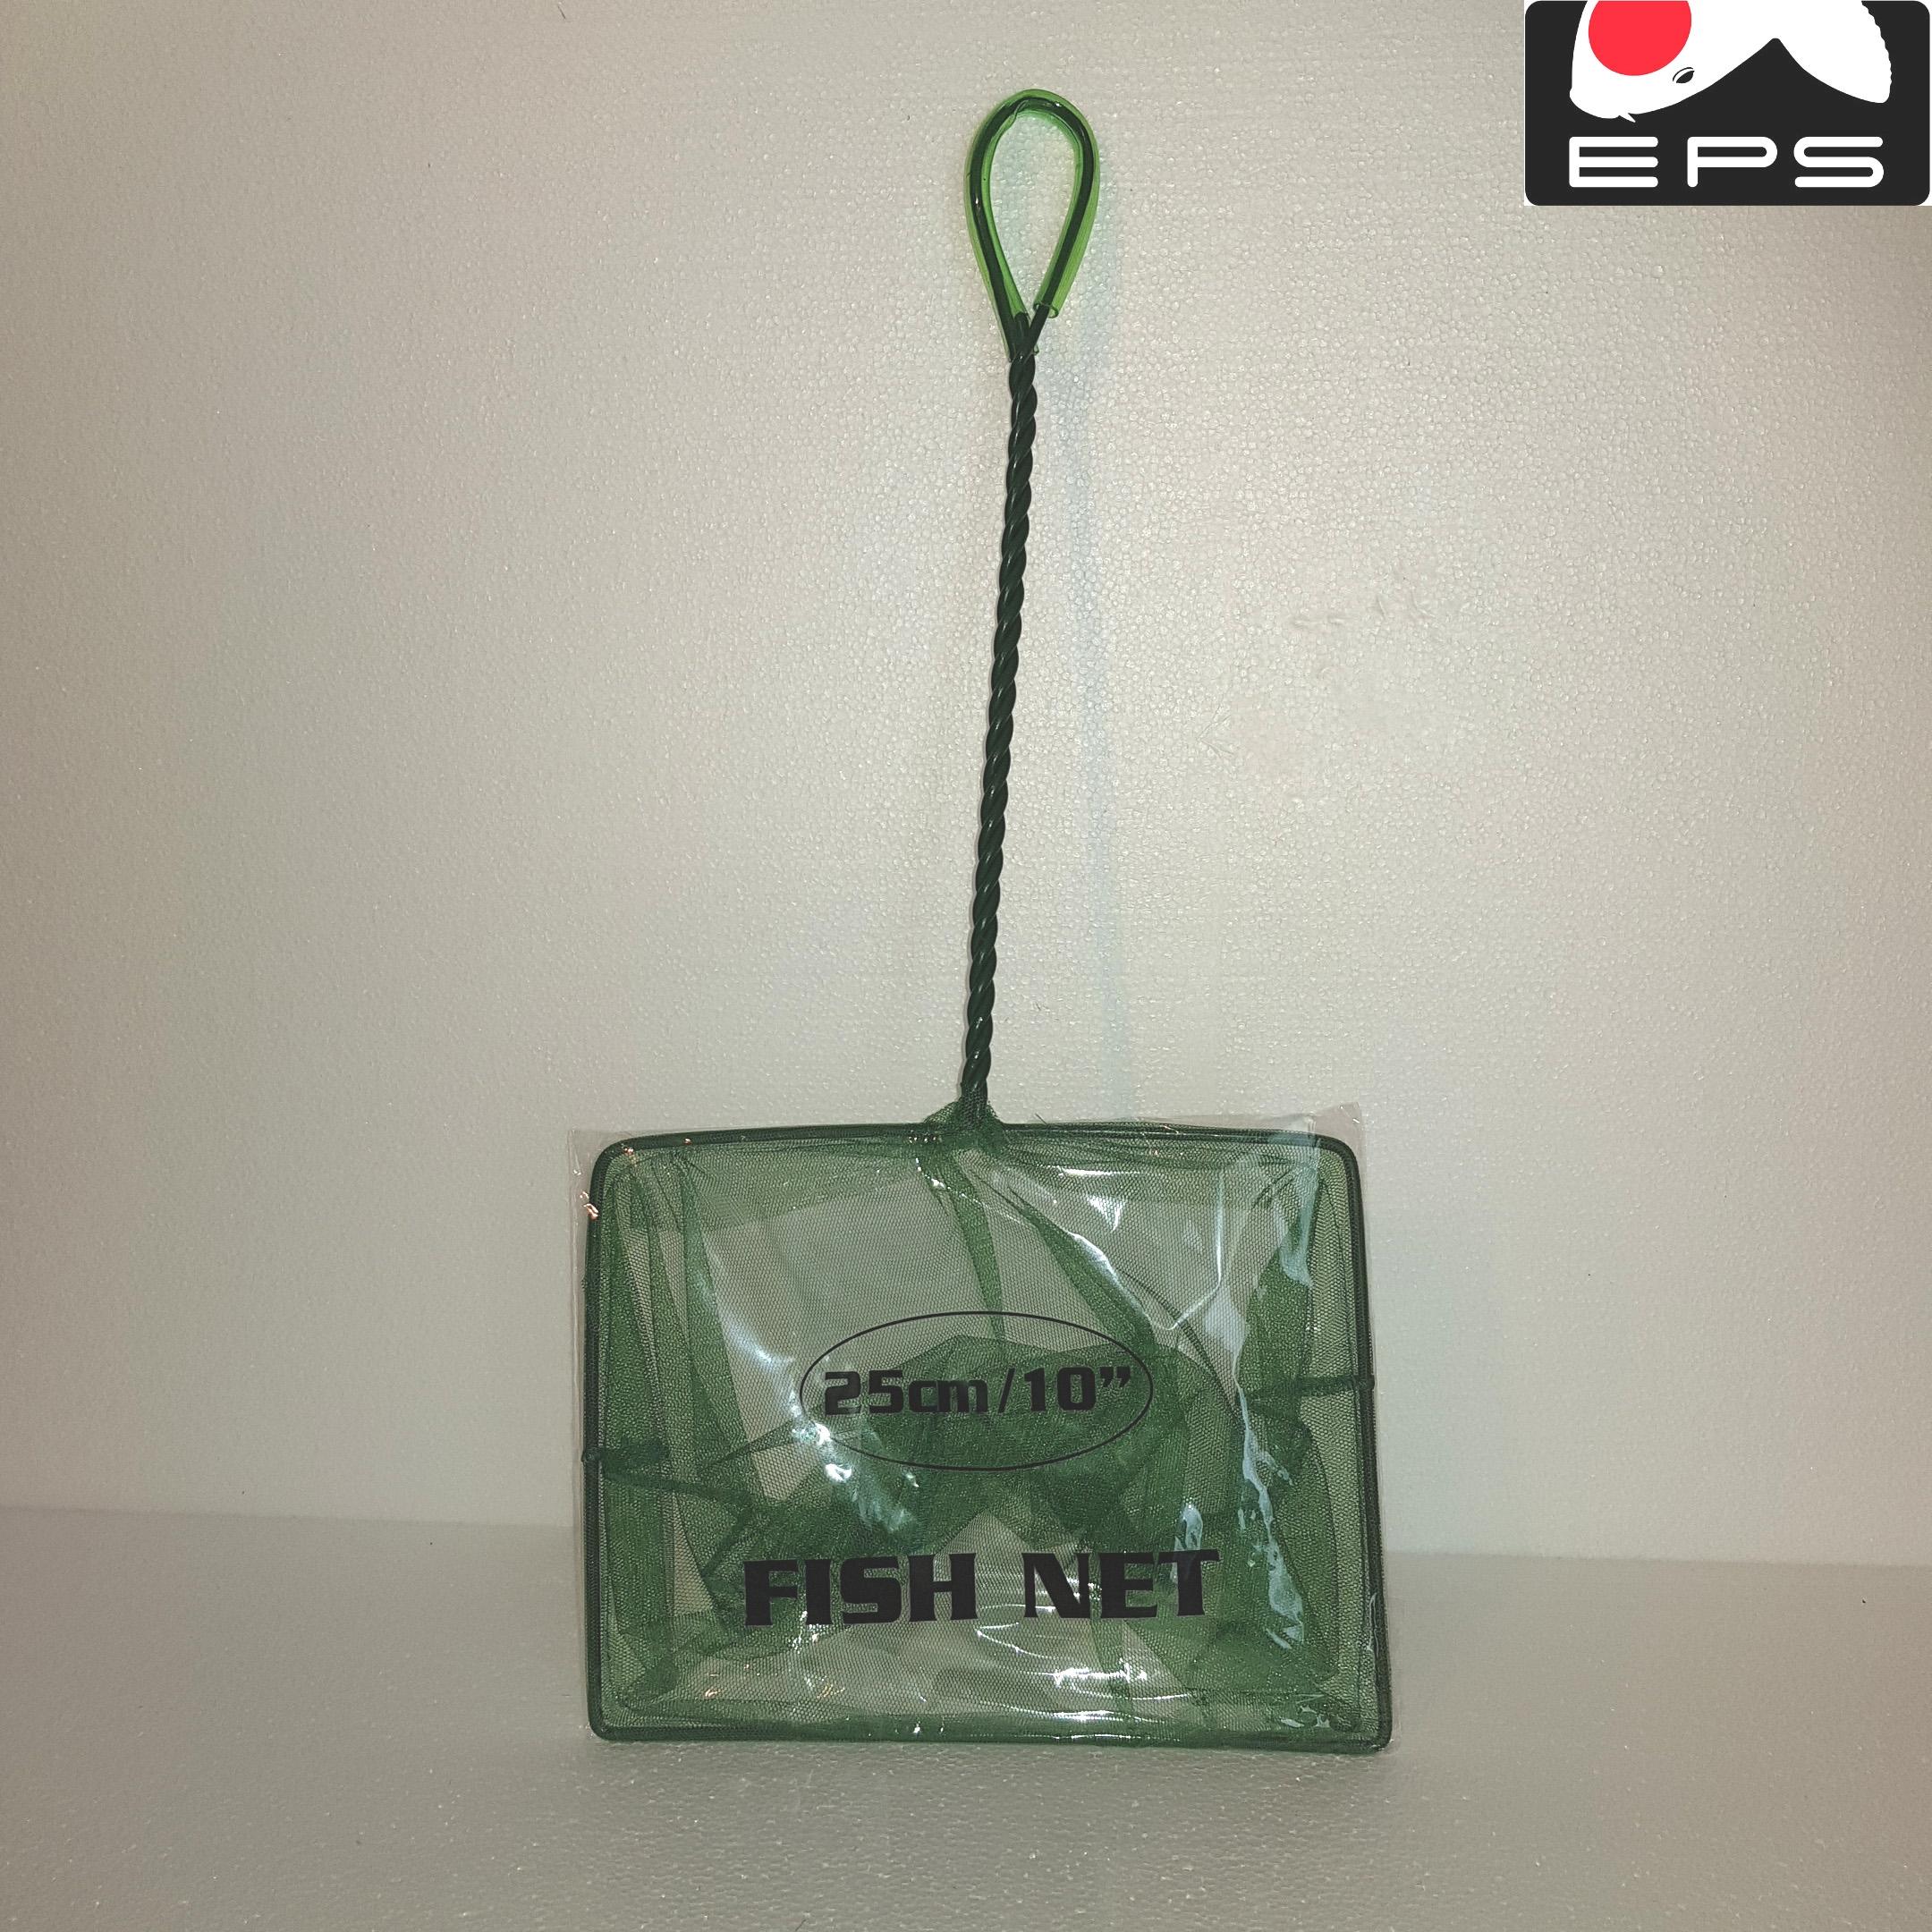 Aquarienkescher, Aquarien-Kescher, Kescher für Aquarien / Aquarium 25 x 18 cm, Griff: 31 cm